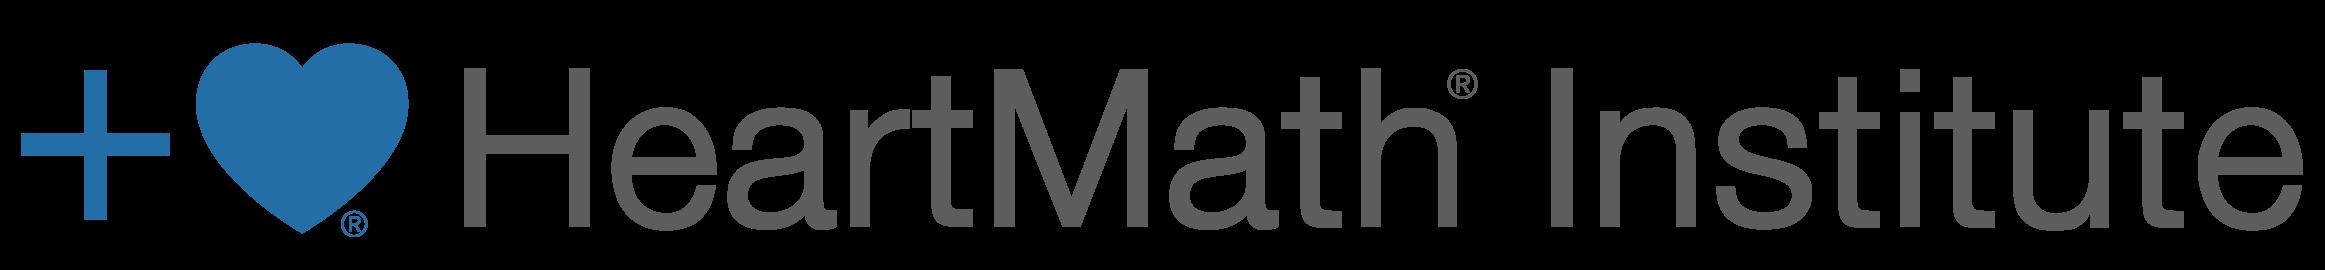 HMI +logo-bg-tm_7.5in_300 rgb.png